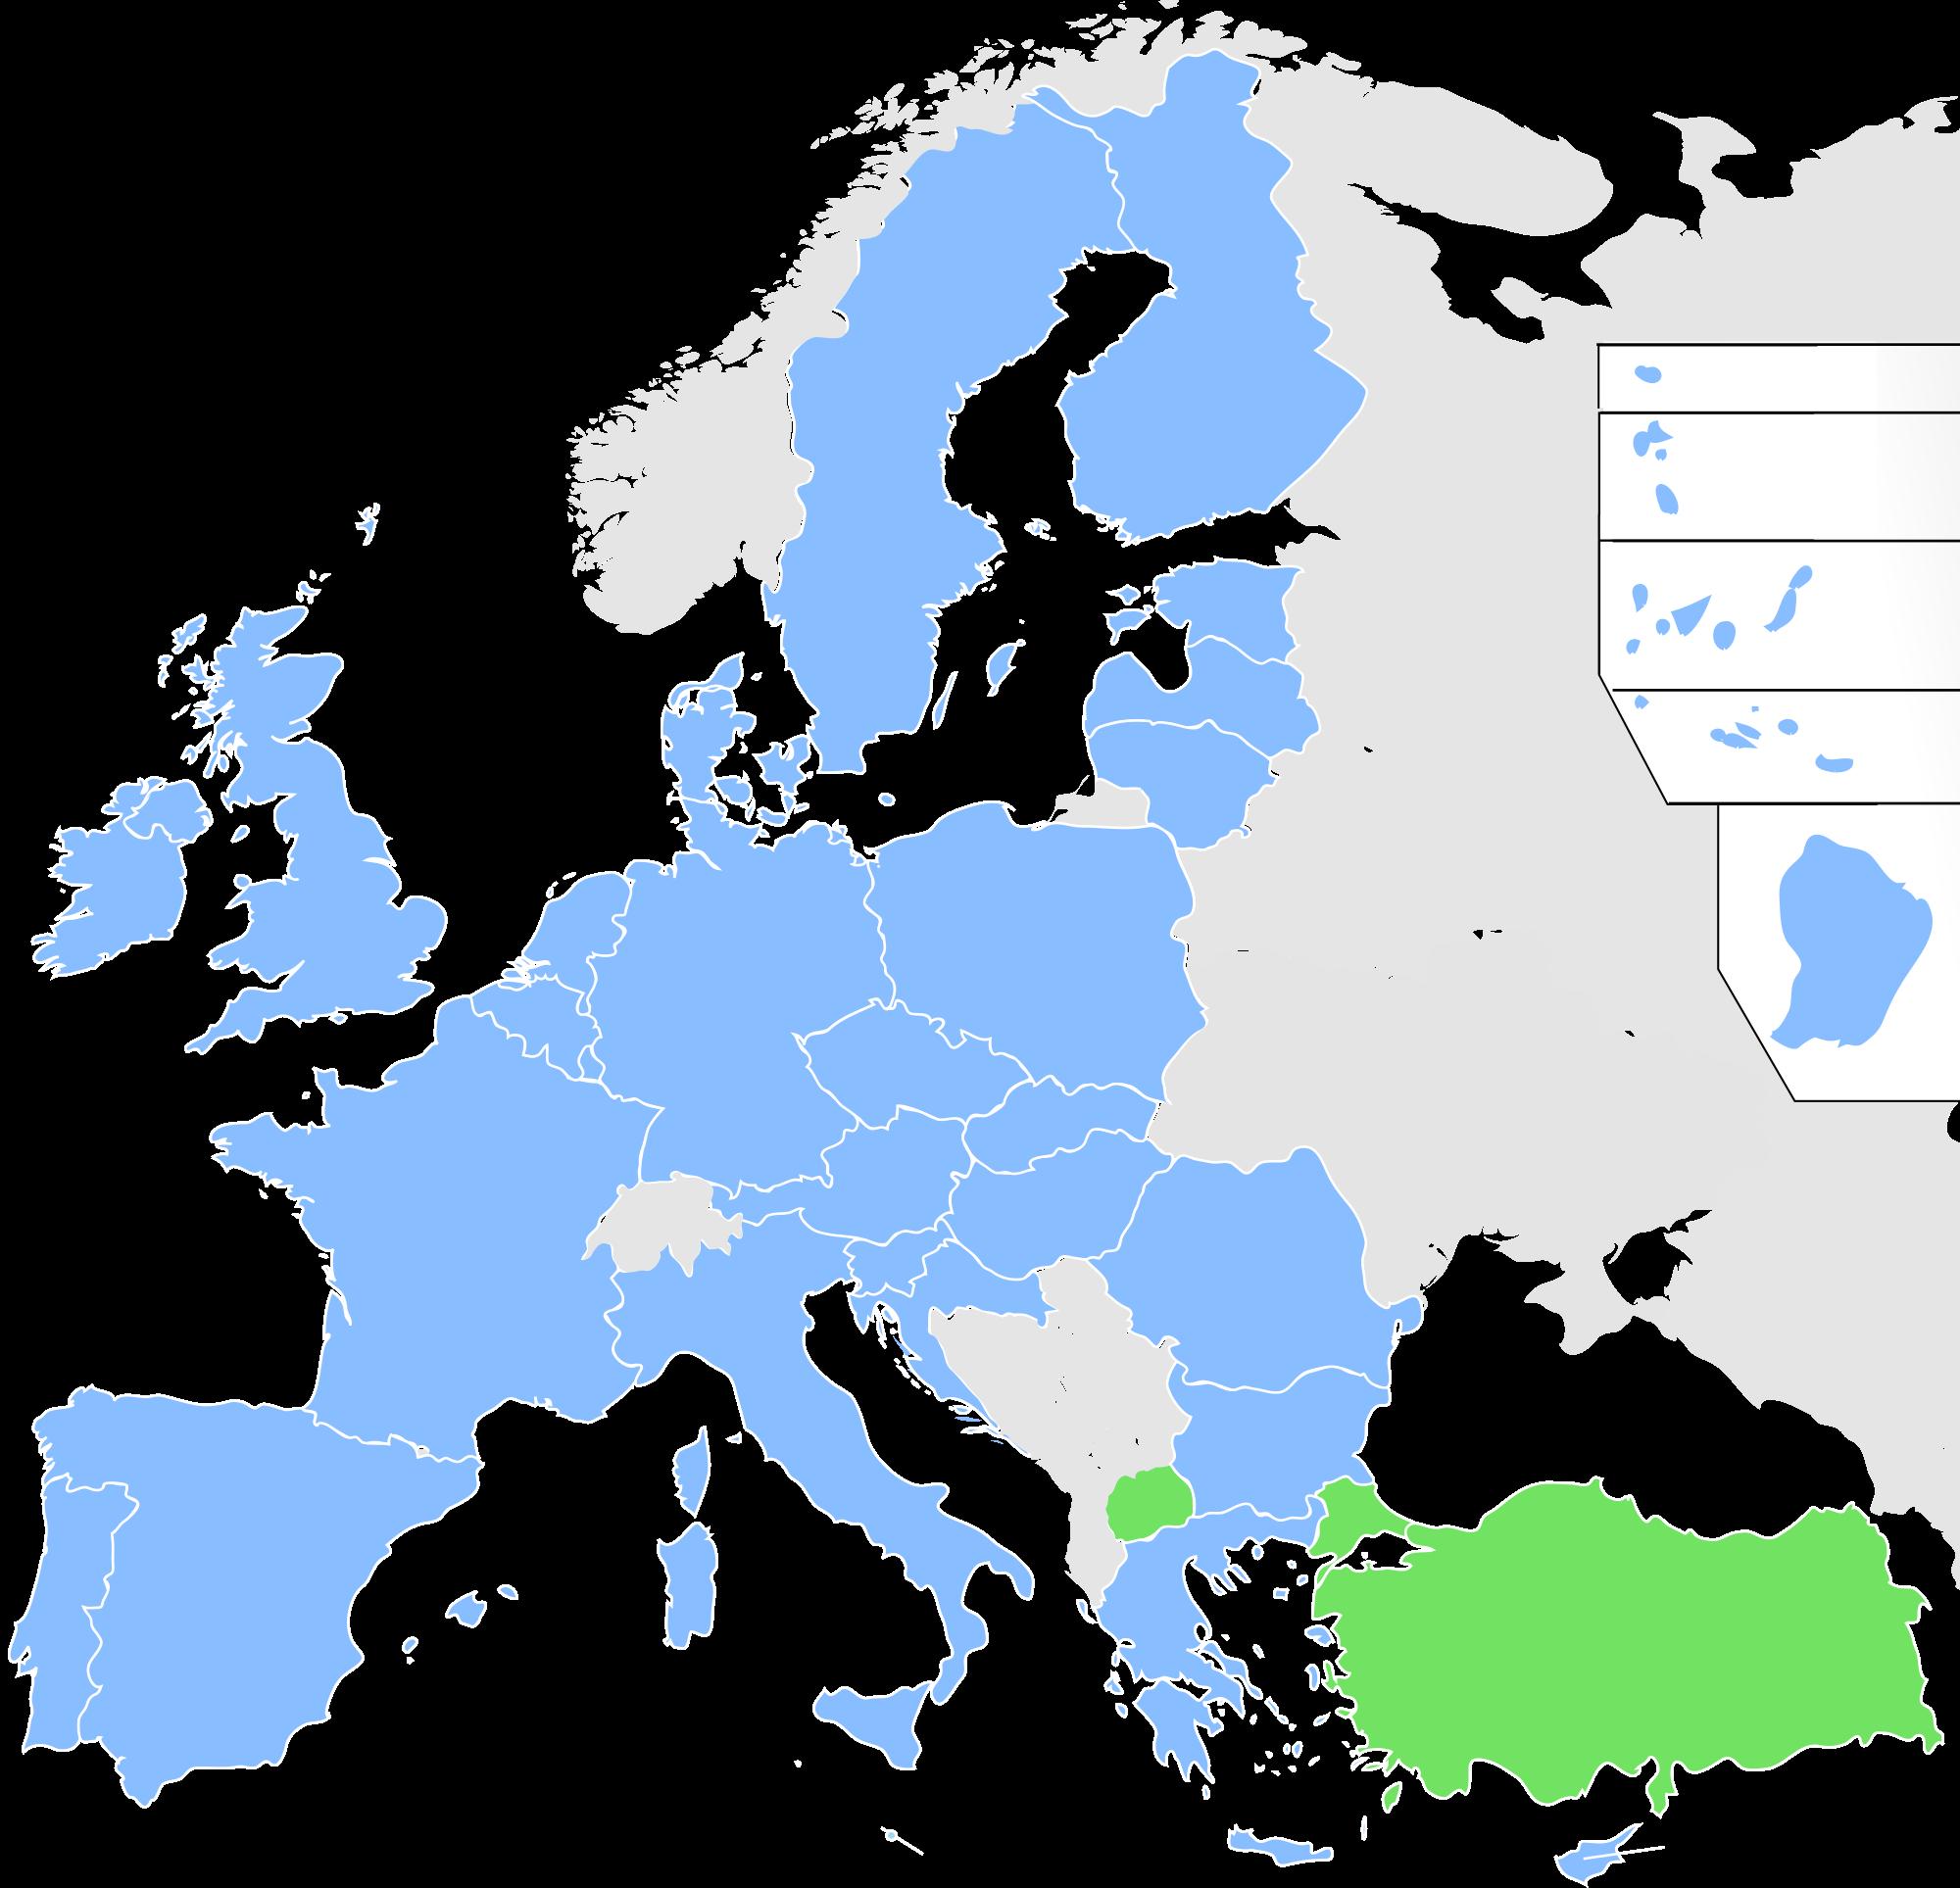 Eu Map Vector at GetDrawings com | Free for personal use Eu